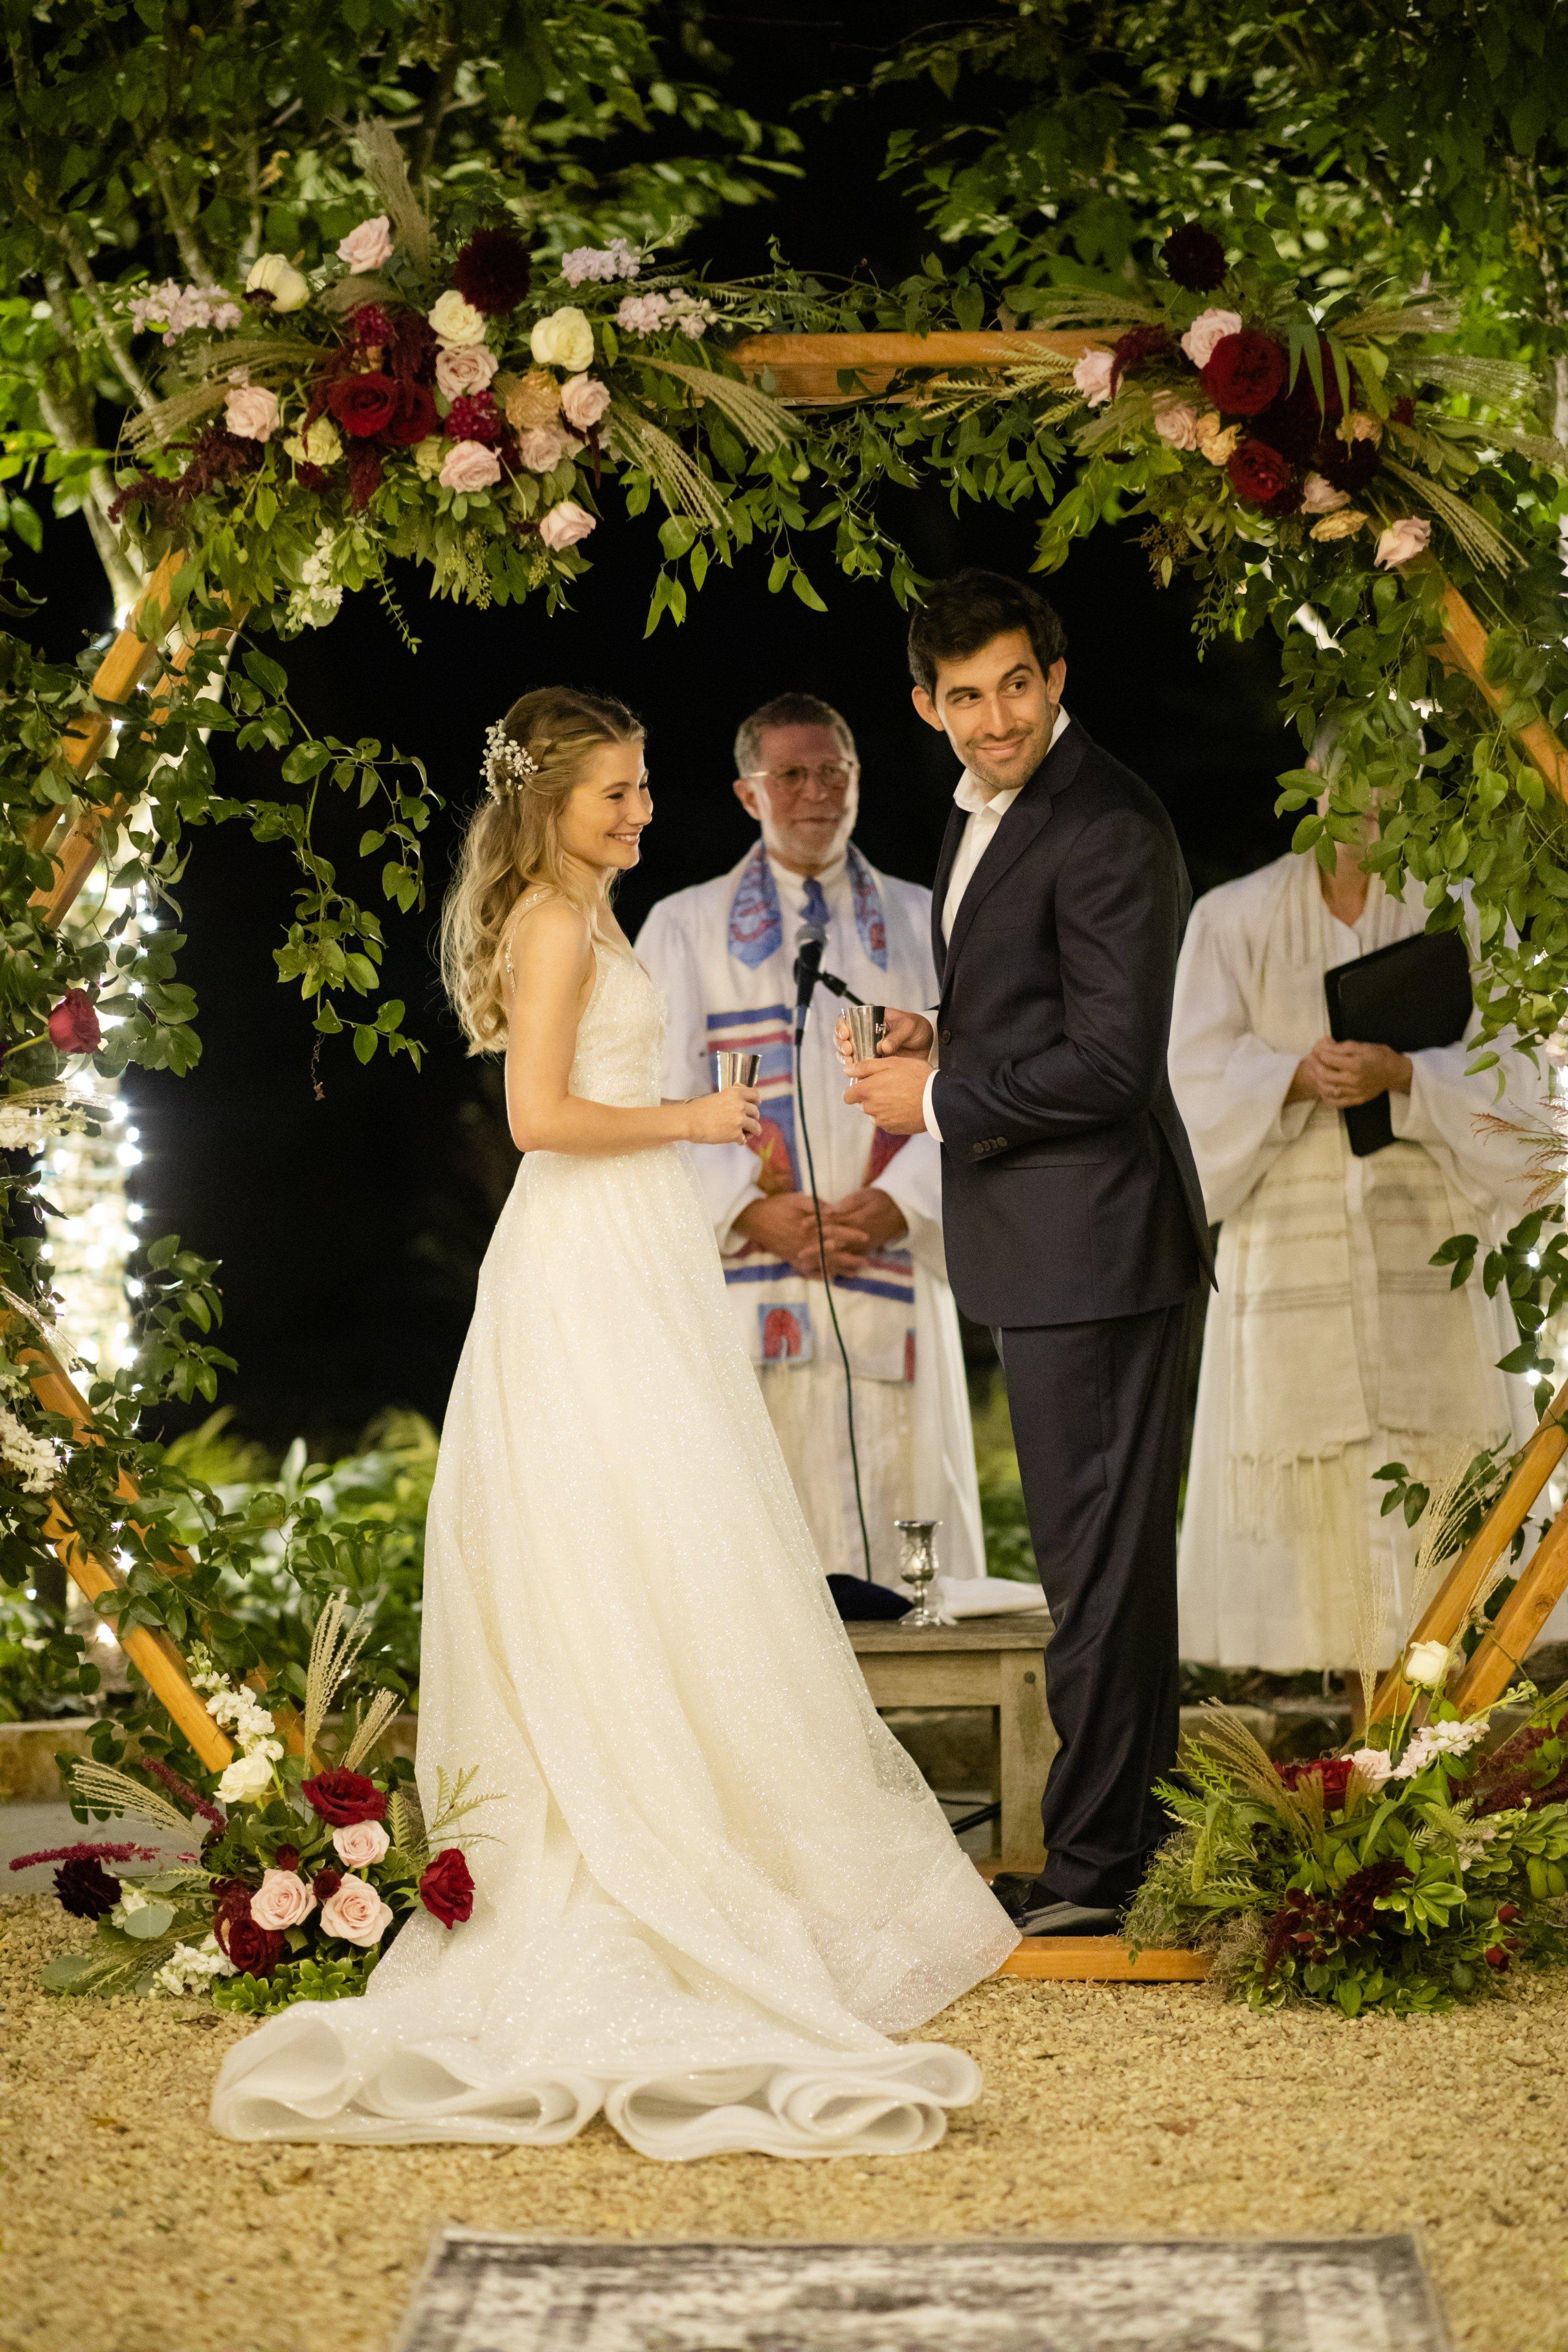 StefanieKamermanPhotography-MelanieandBenjamin-Wedding-Bethesda,MD-2019-10-12-281